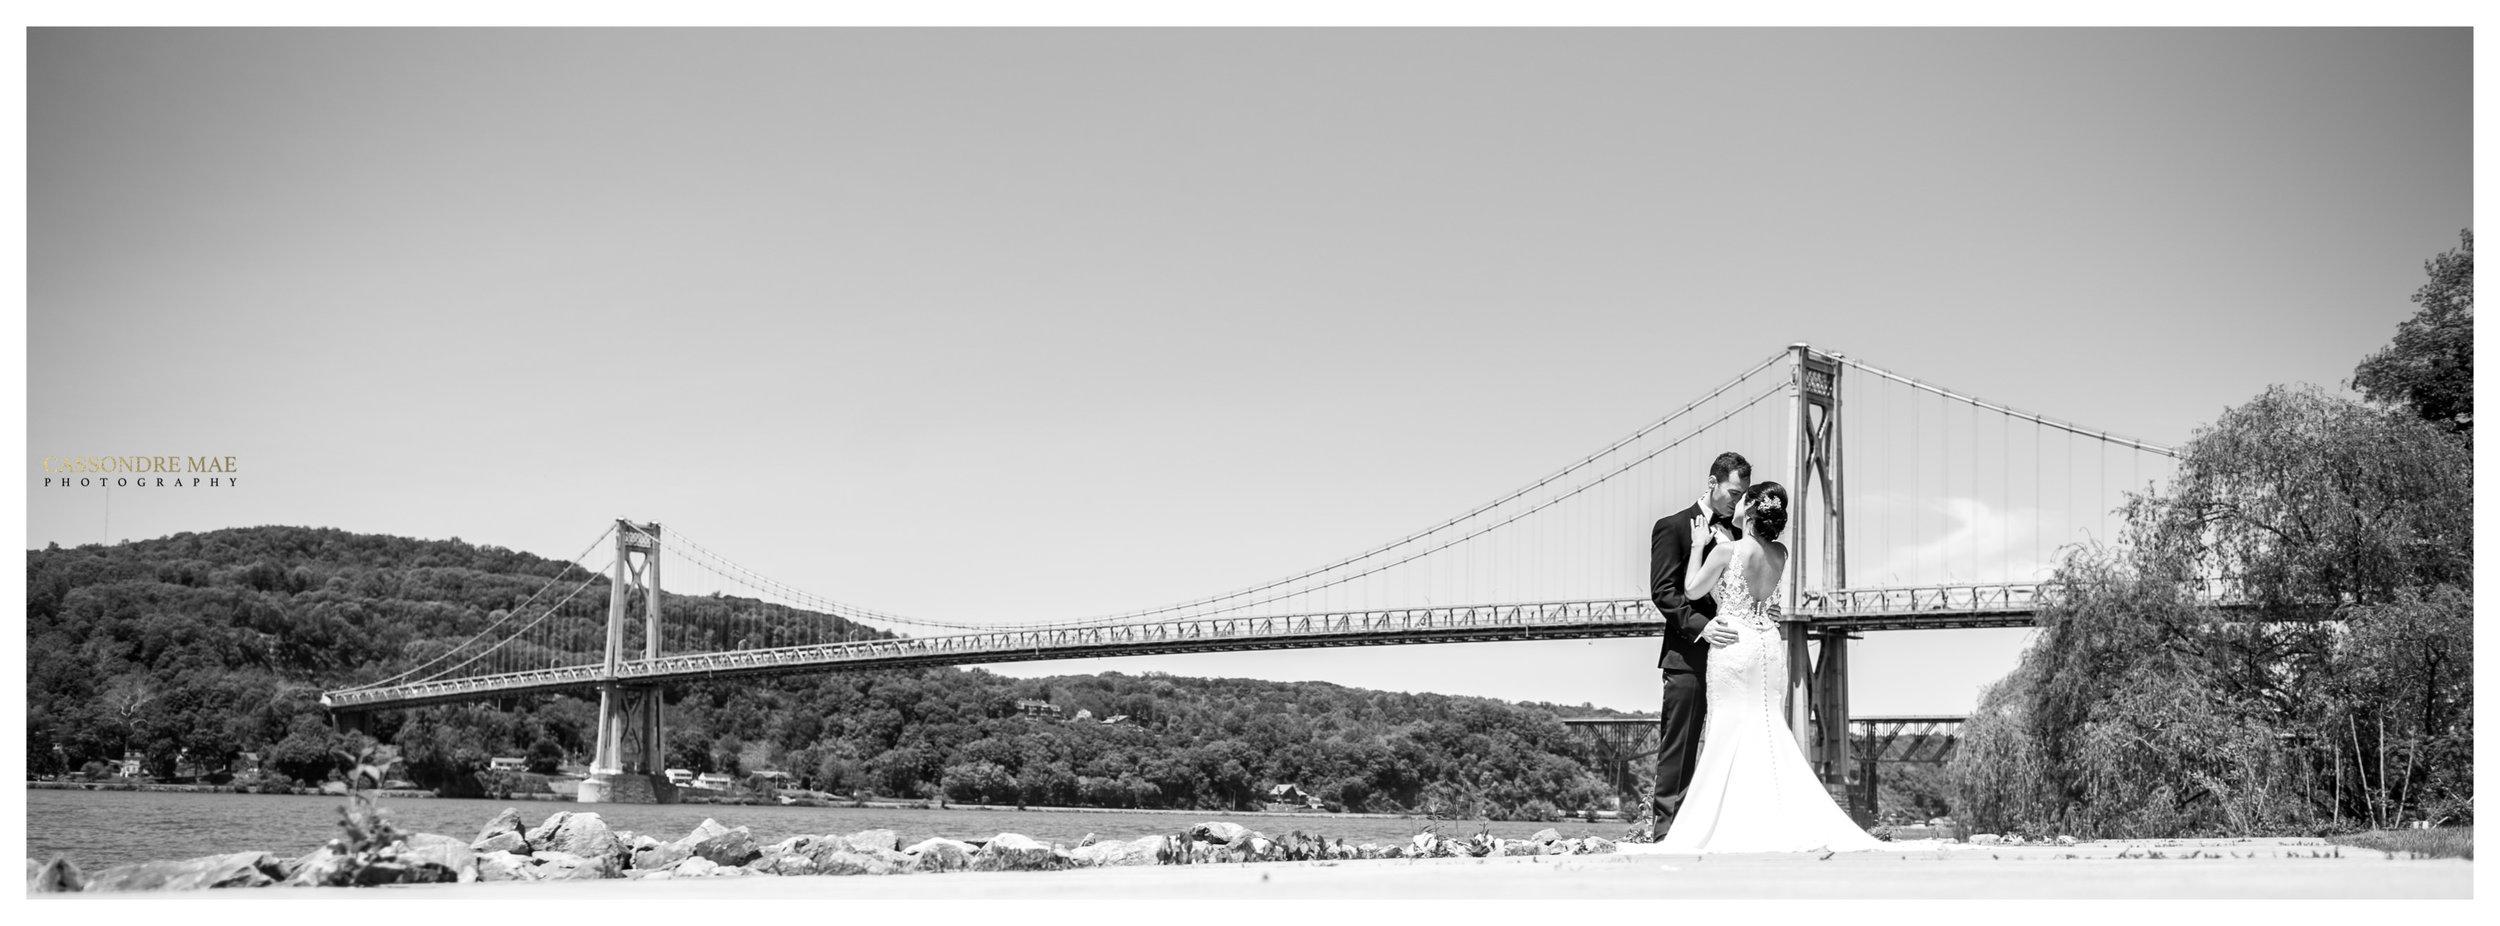 Cassondre Mae Photography The Grandview Poughkeepsie NY Wedding